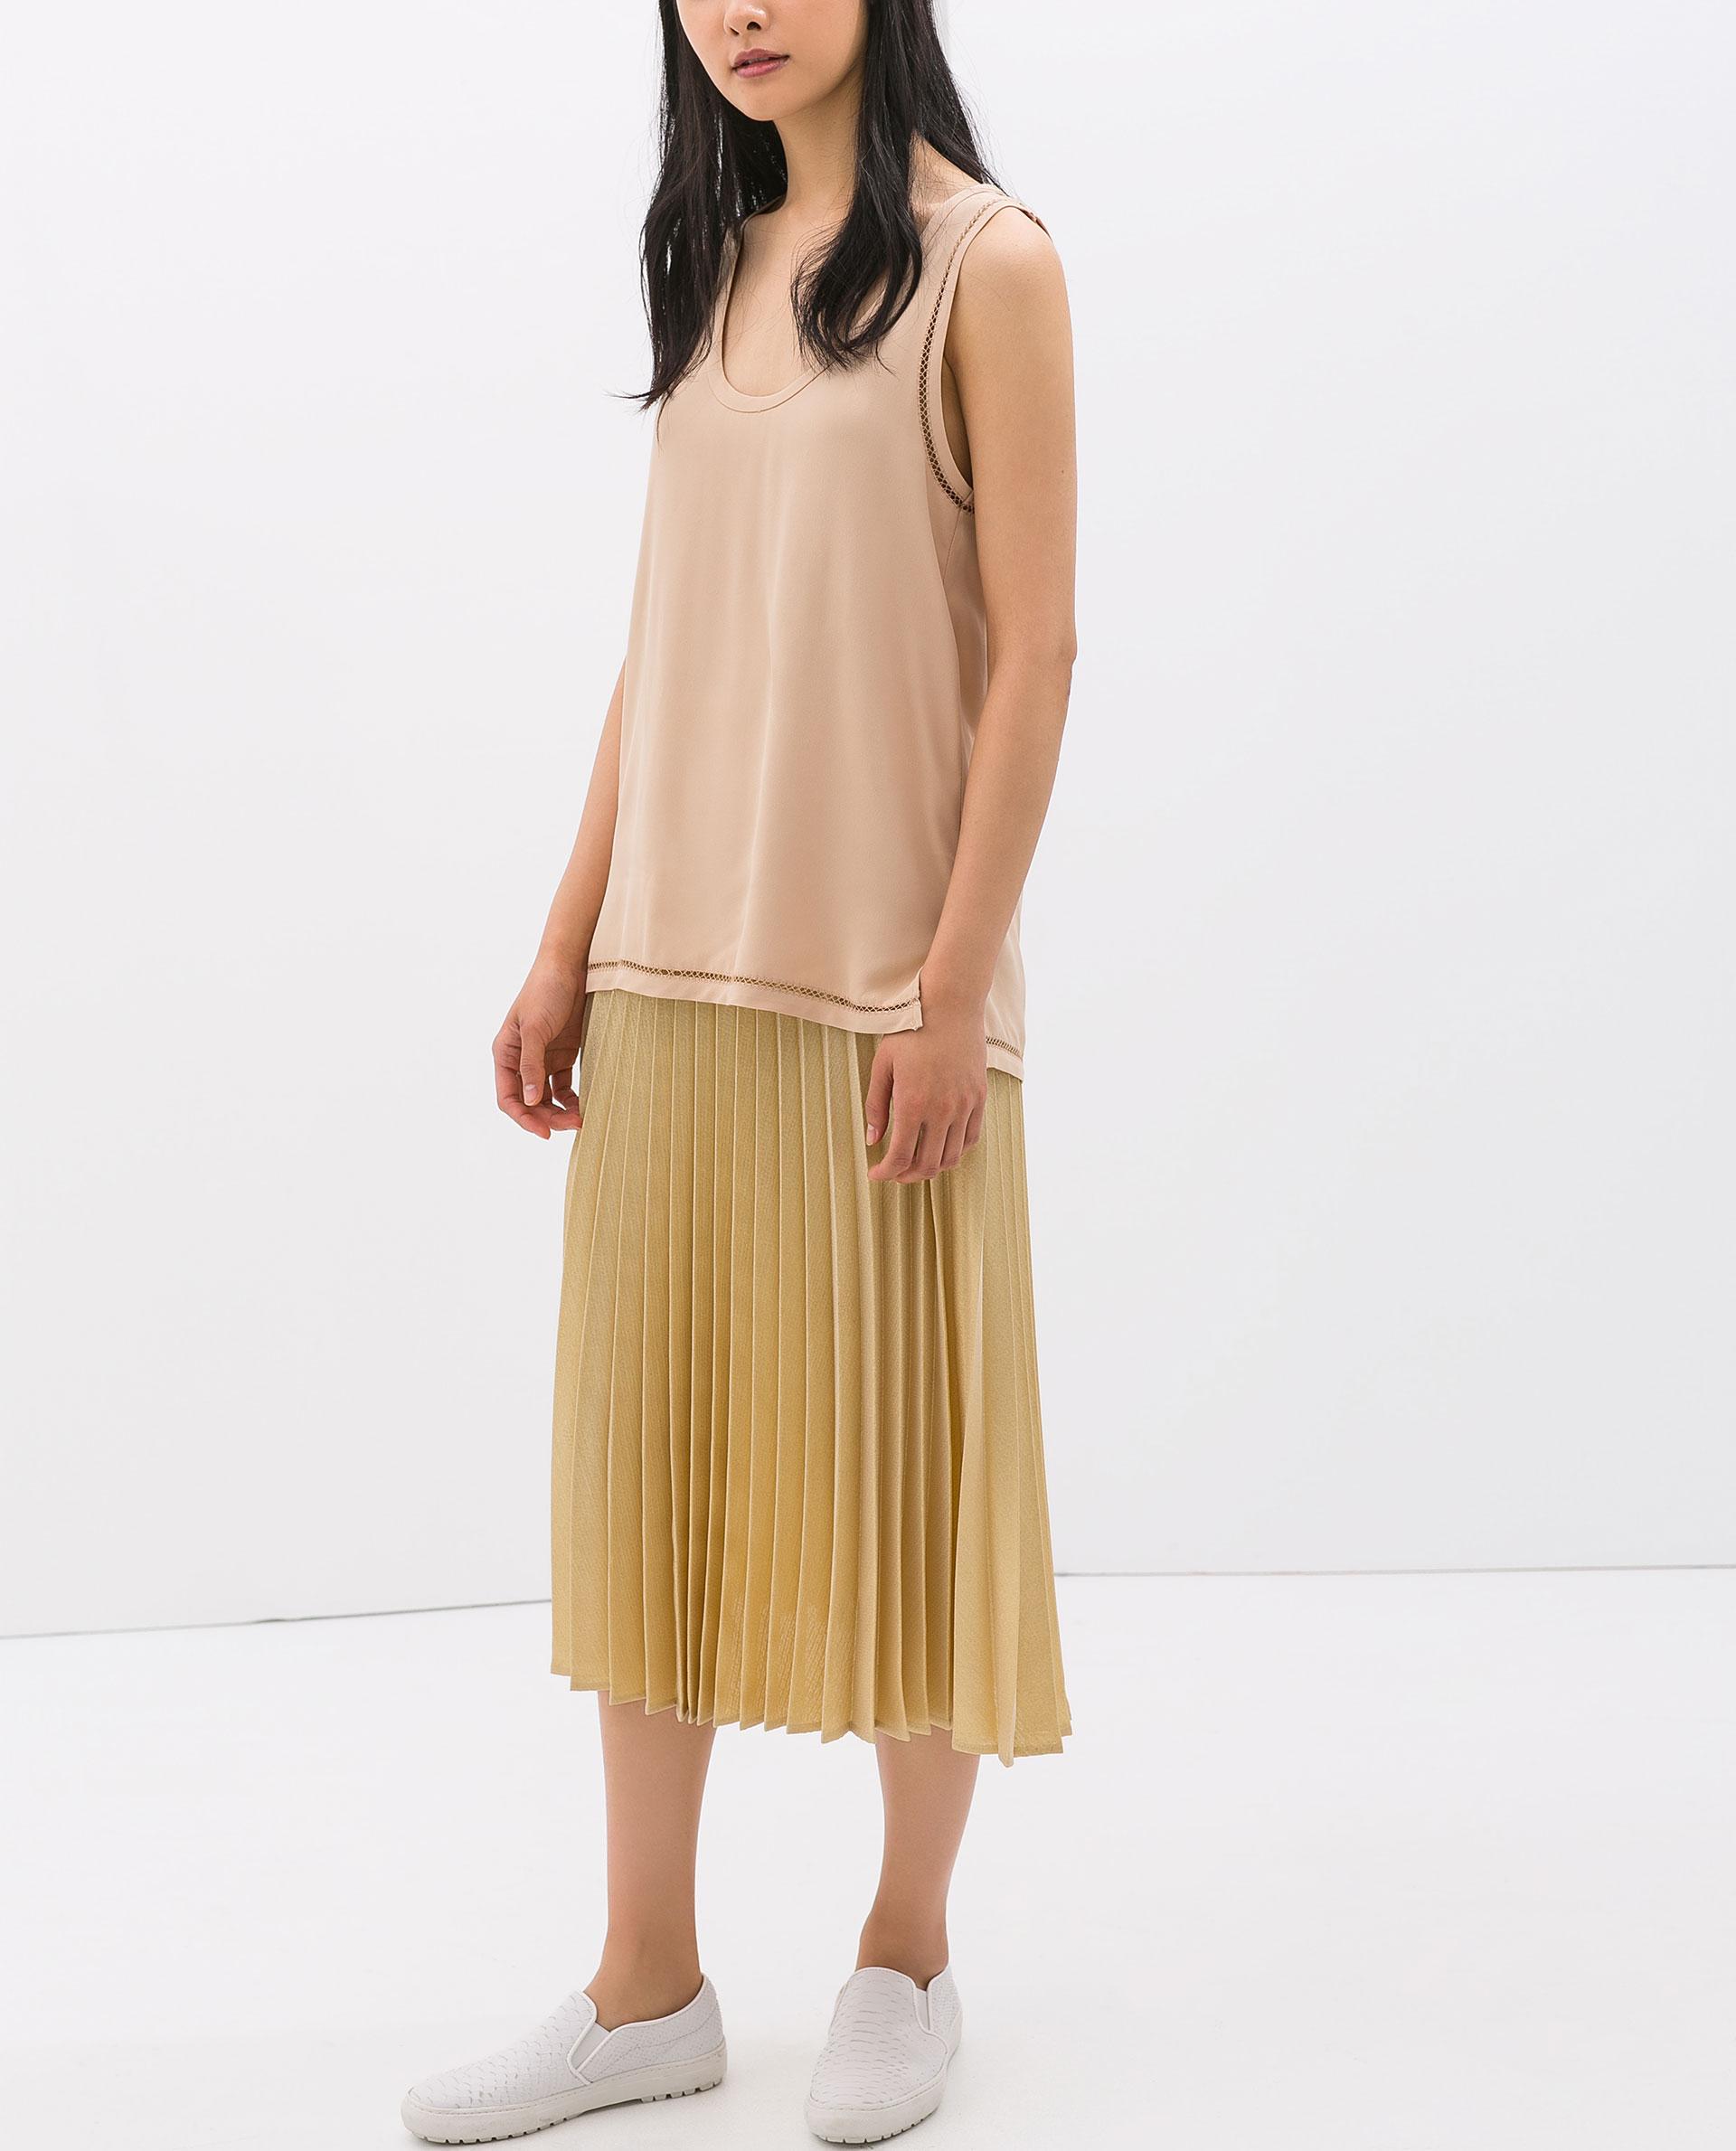 Zara Gold Pleated Skirt in Metallic | Lyst